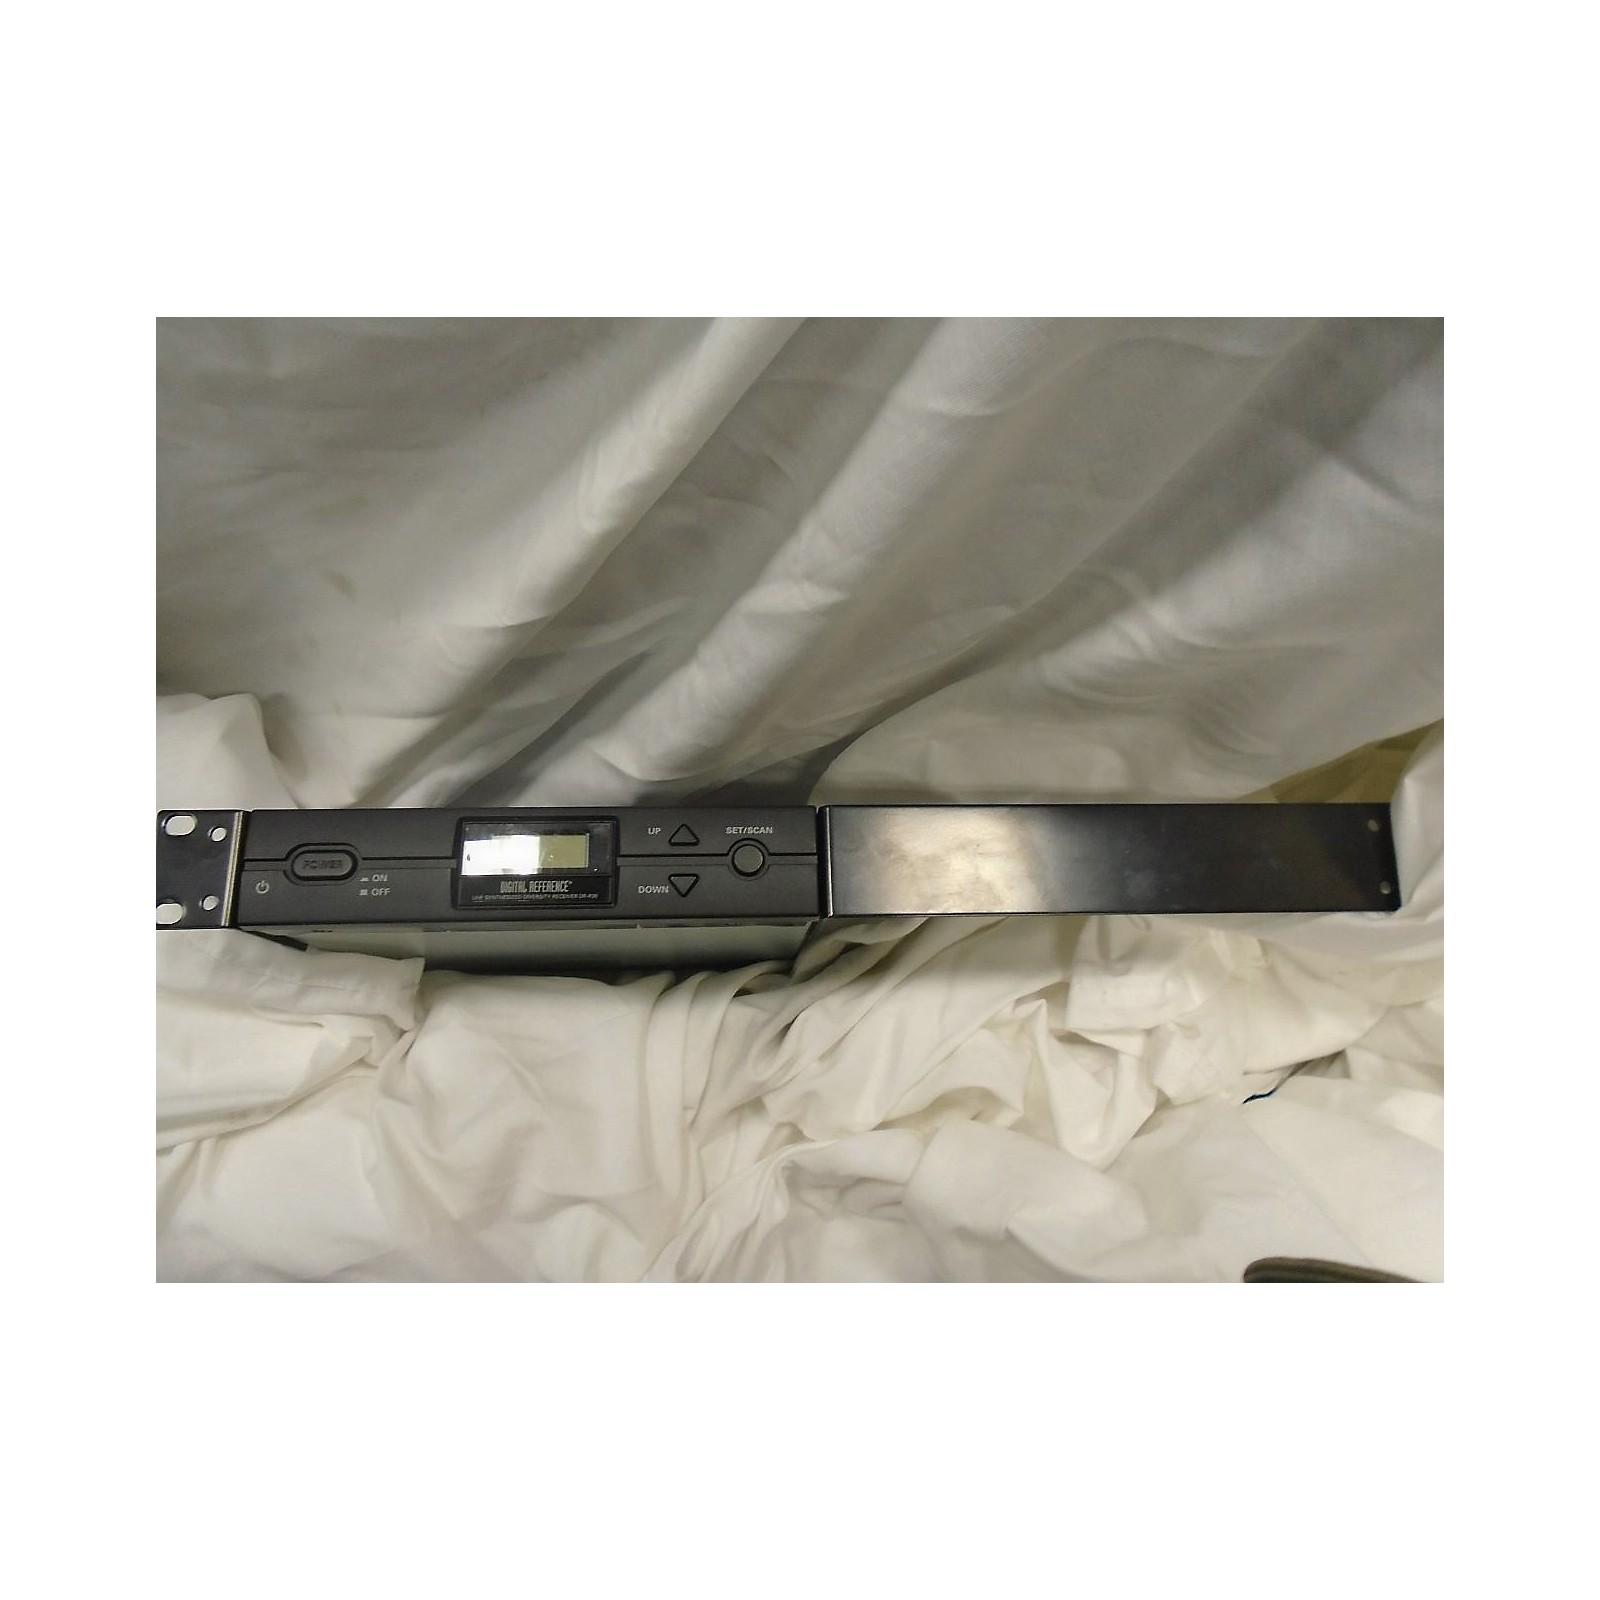 Digital Reference ATWR2100 Instrument Wireless System